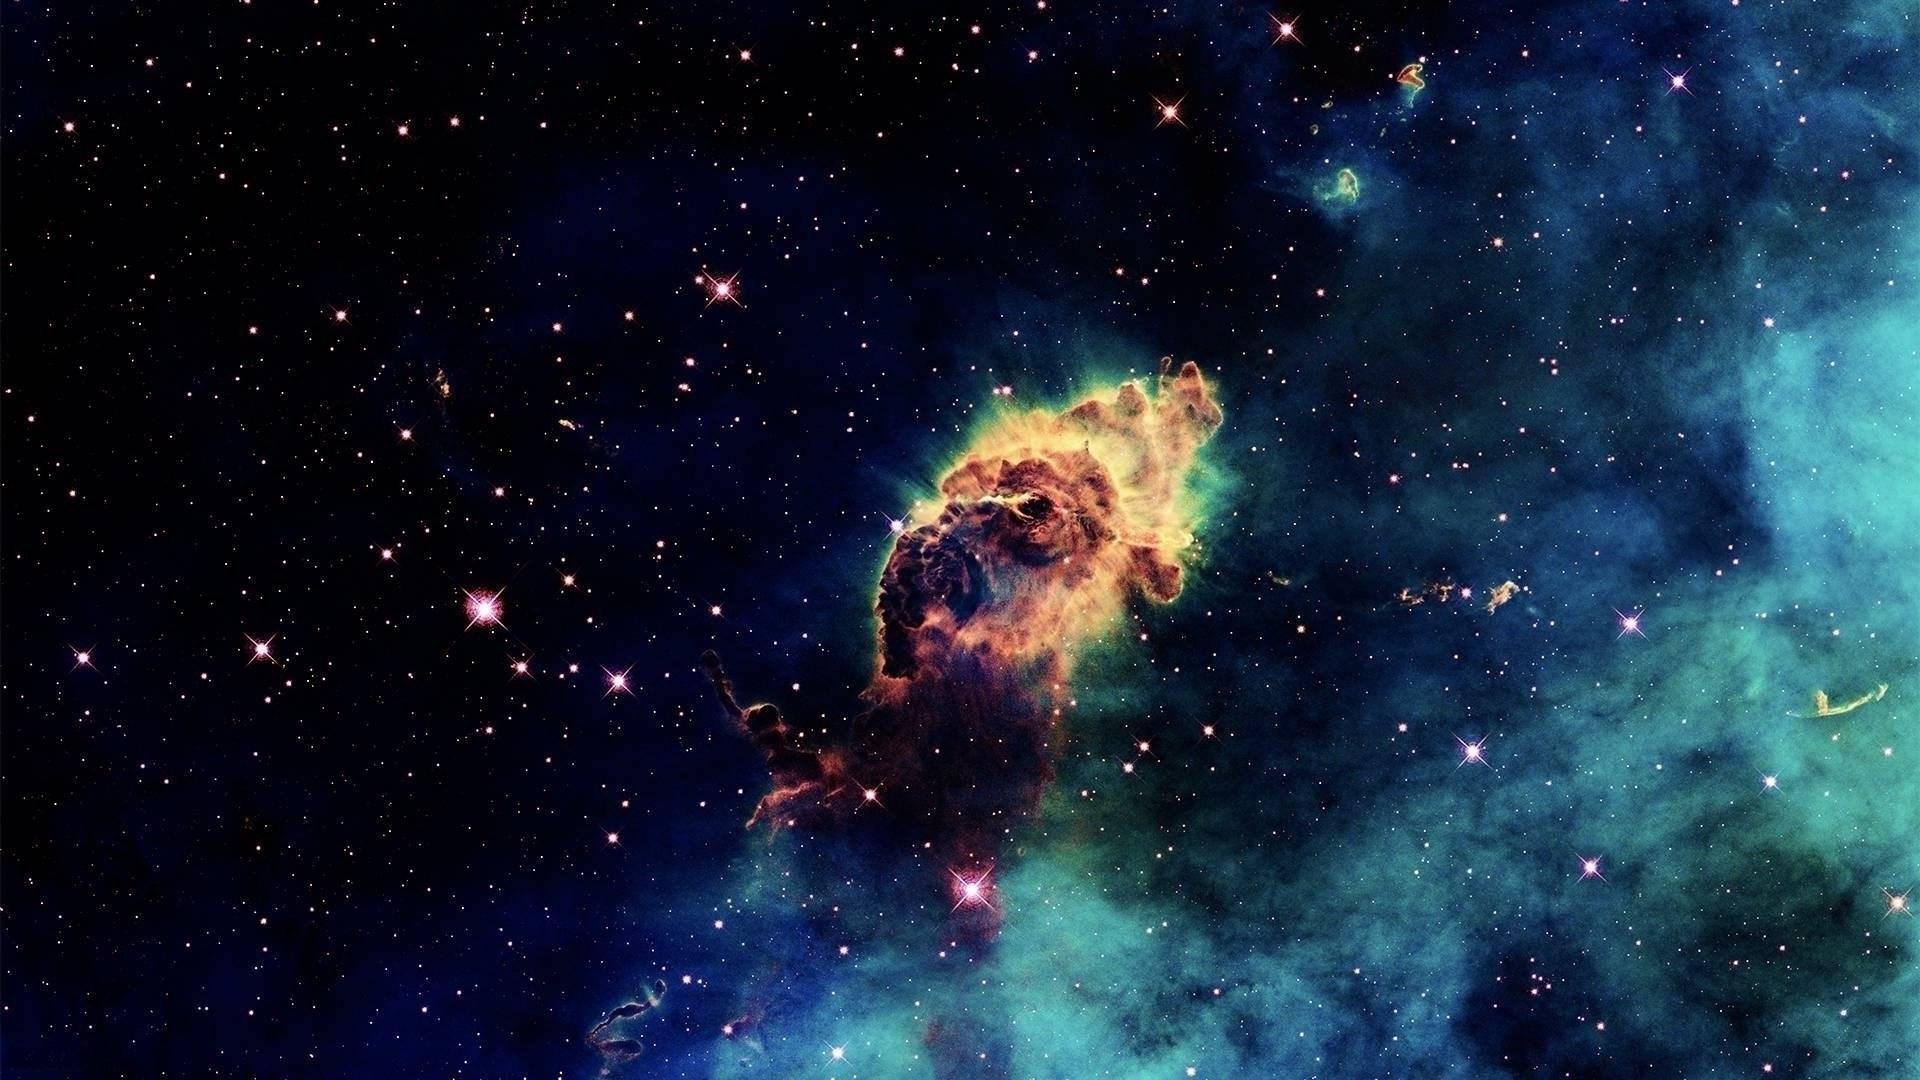 Outer Space Universe Nebula Stars Wallpaper 1920x1080